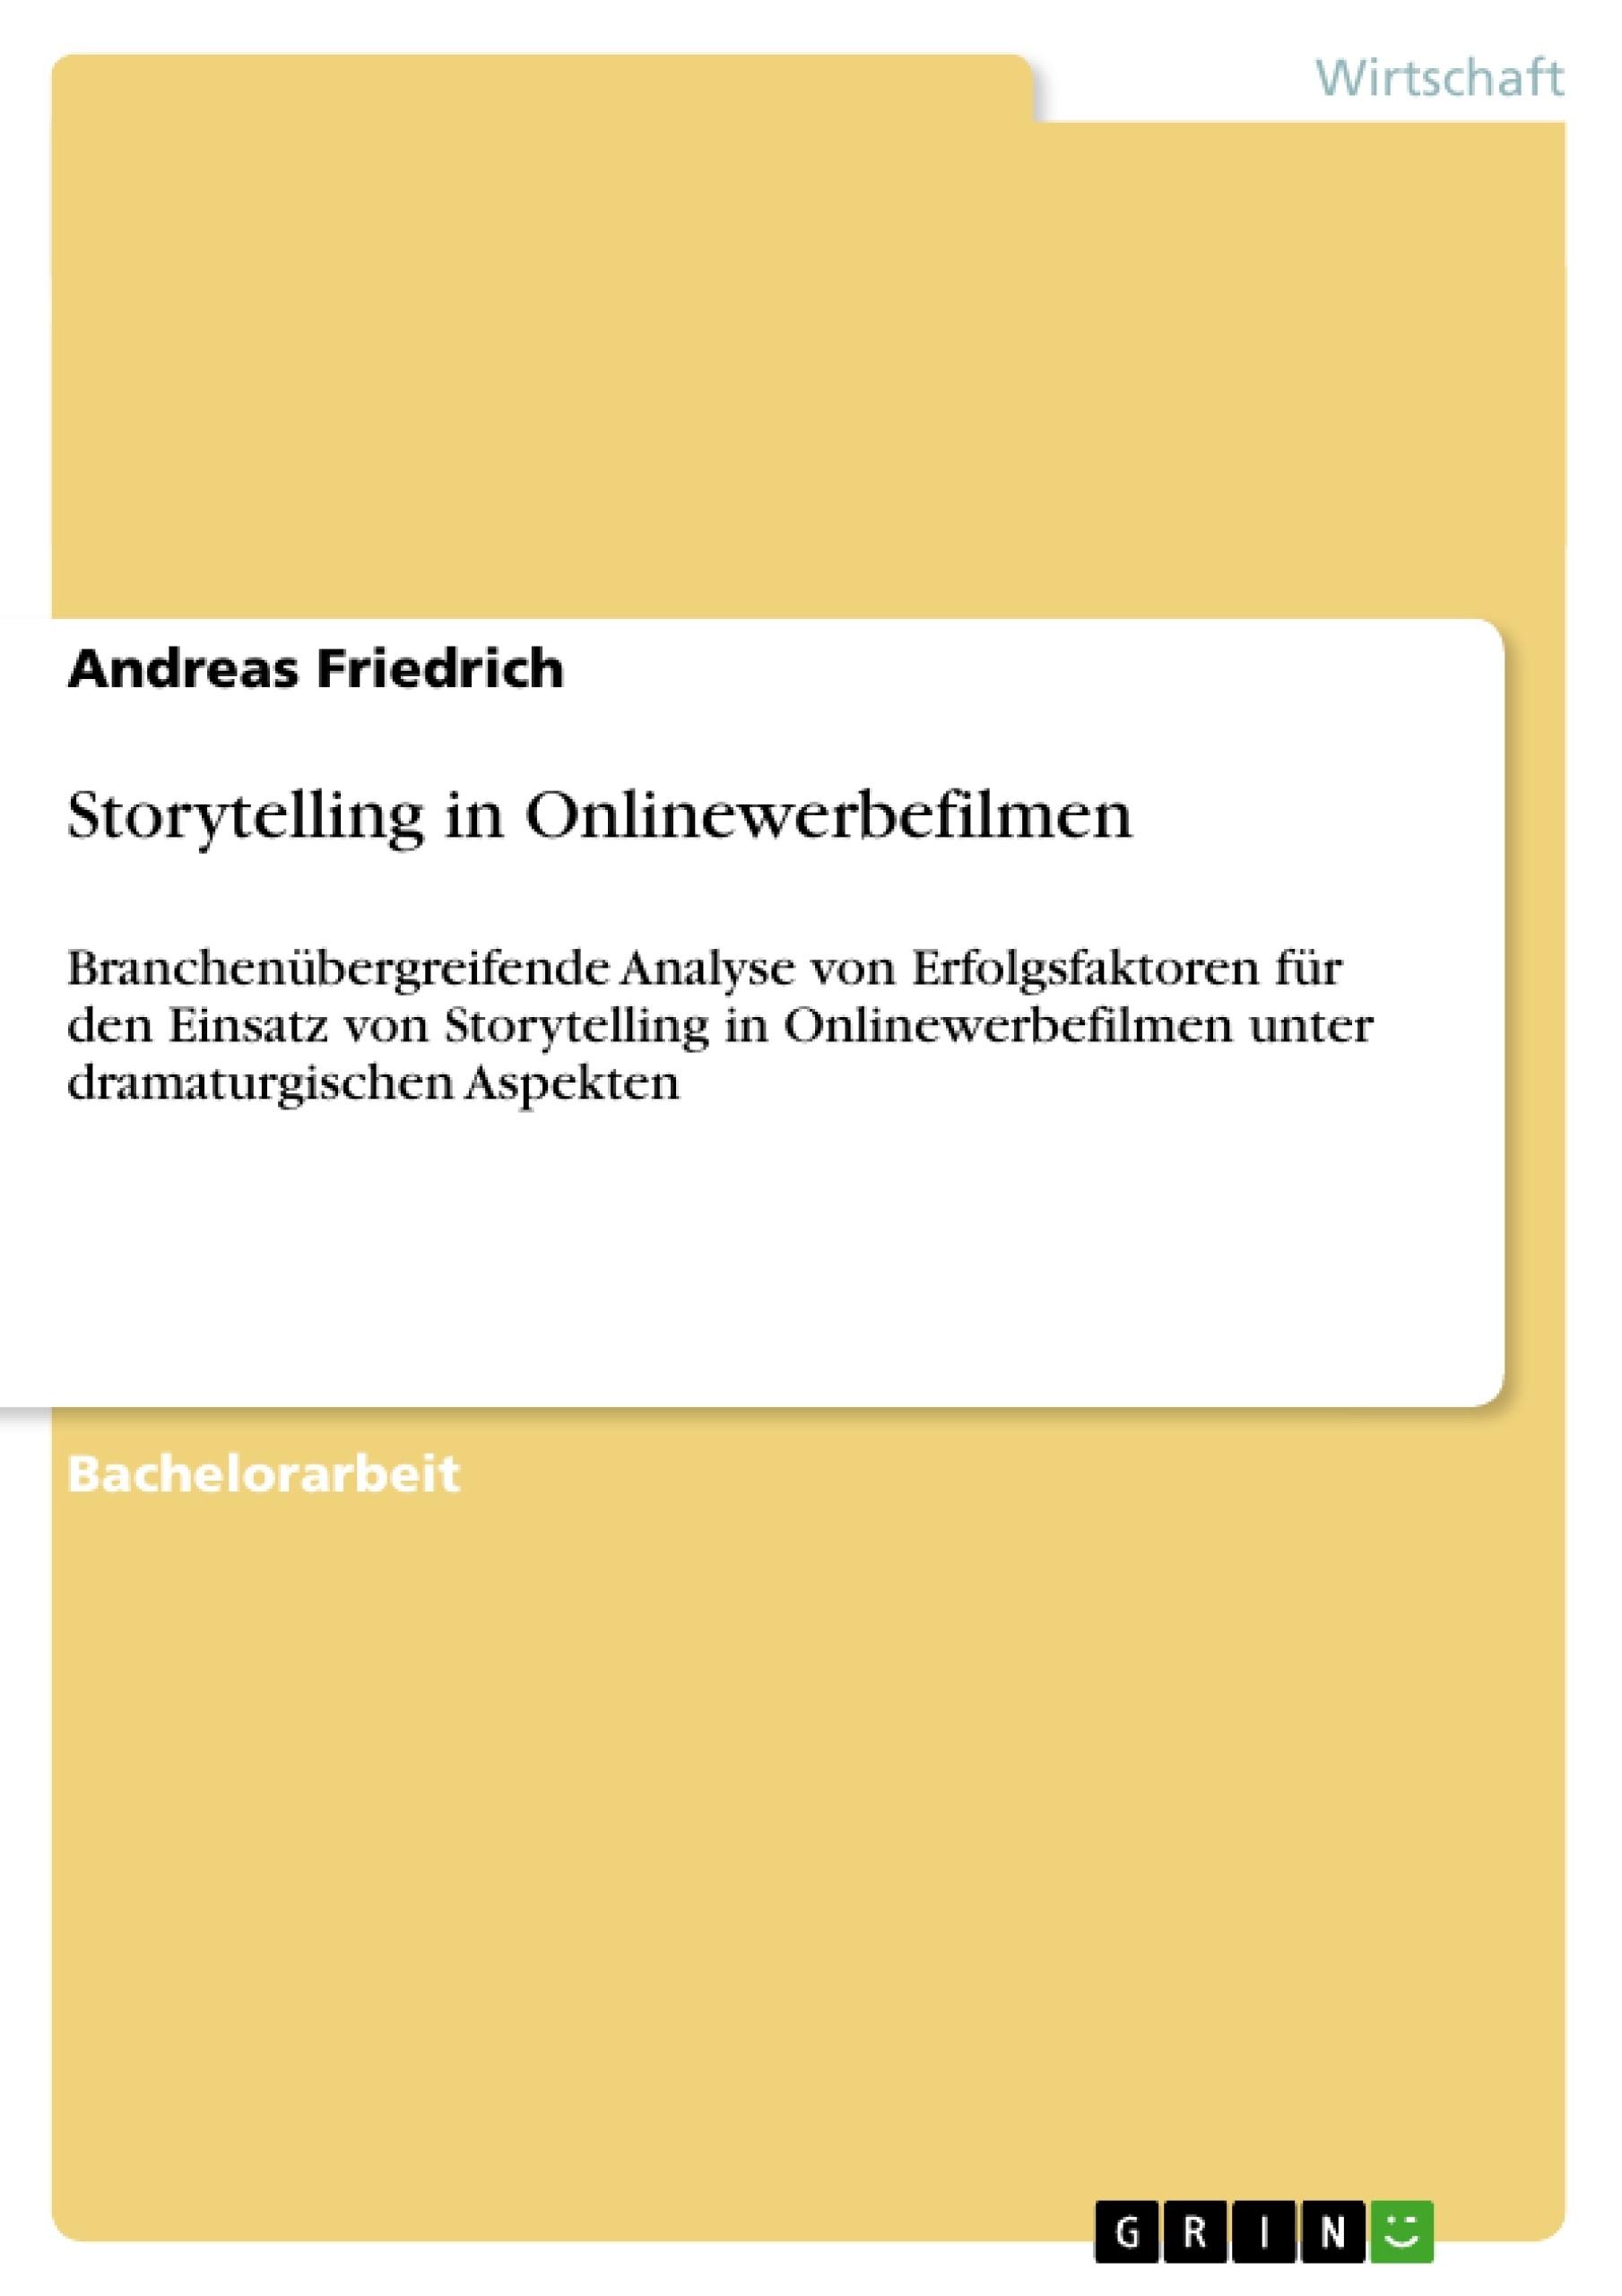 Titel: Storytelling in Onlinewerbefilmen